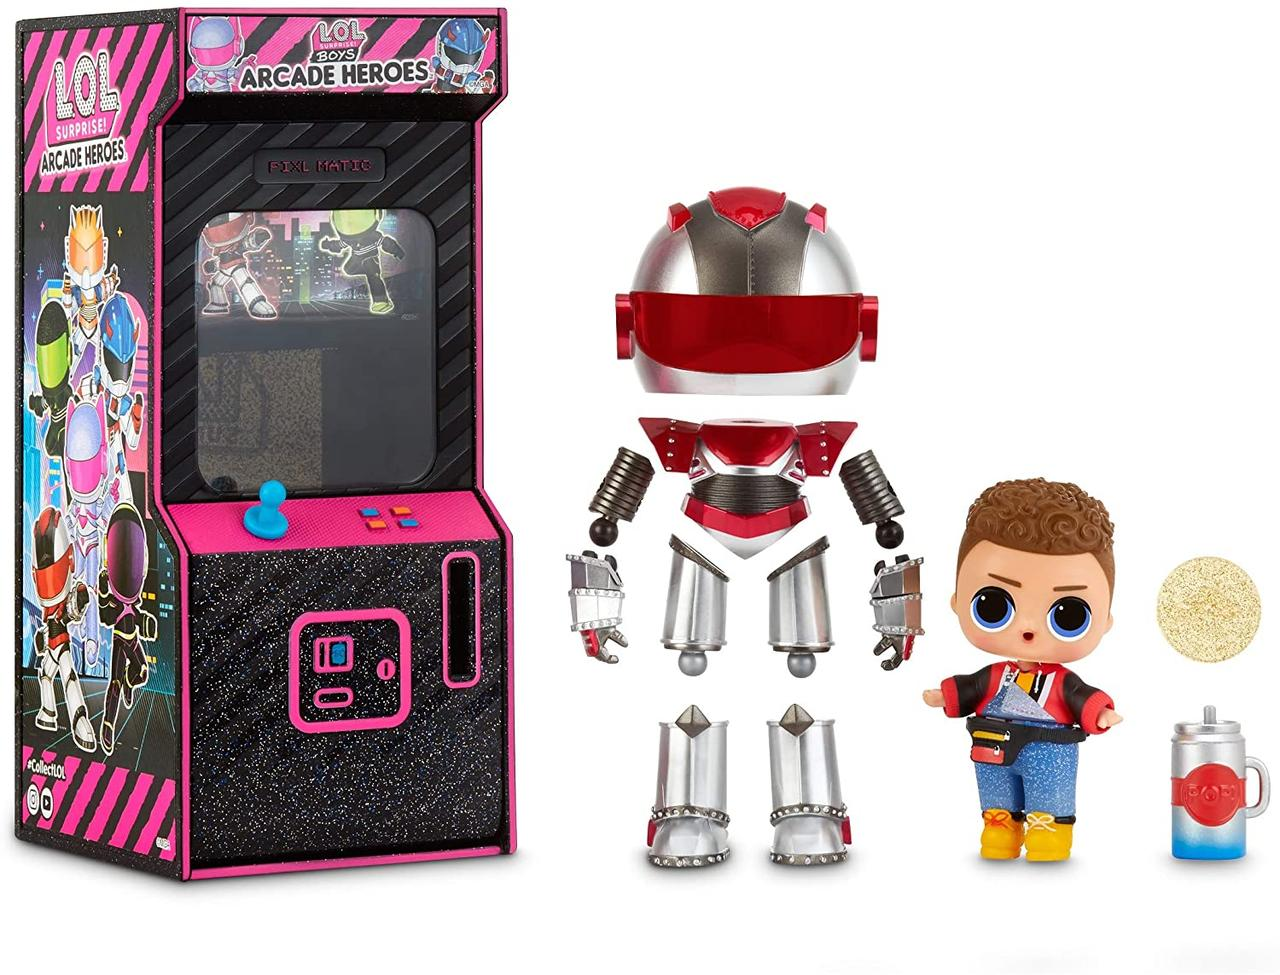 L.O.L. Surprise! Мальчики Космонавты Герои аркады Gear Guy Titanium  Boys Arcade Heroes